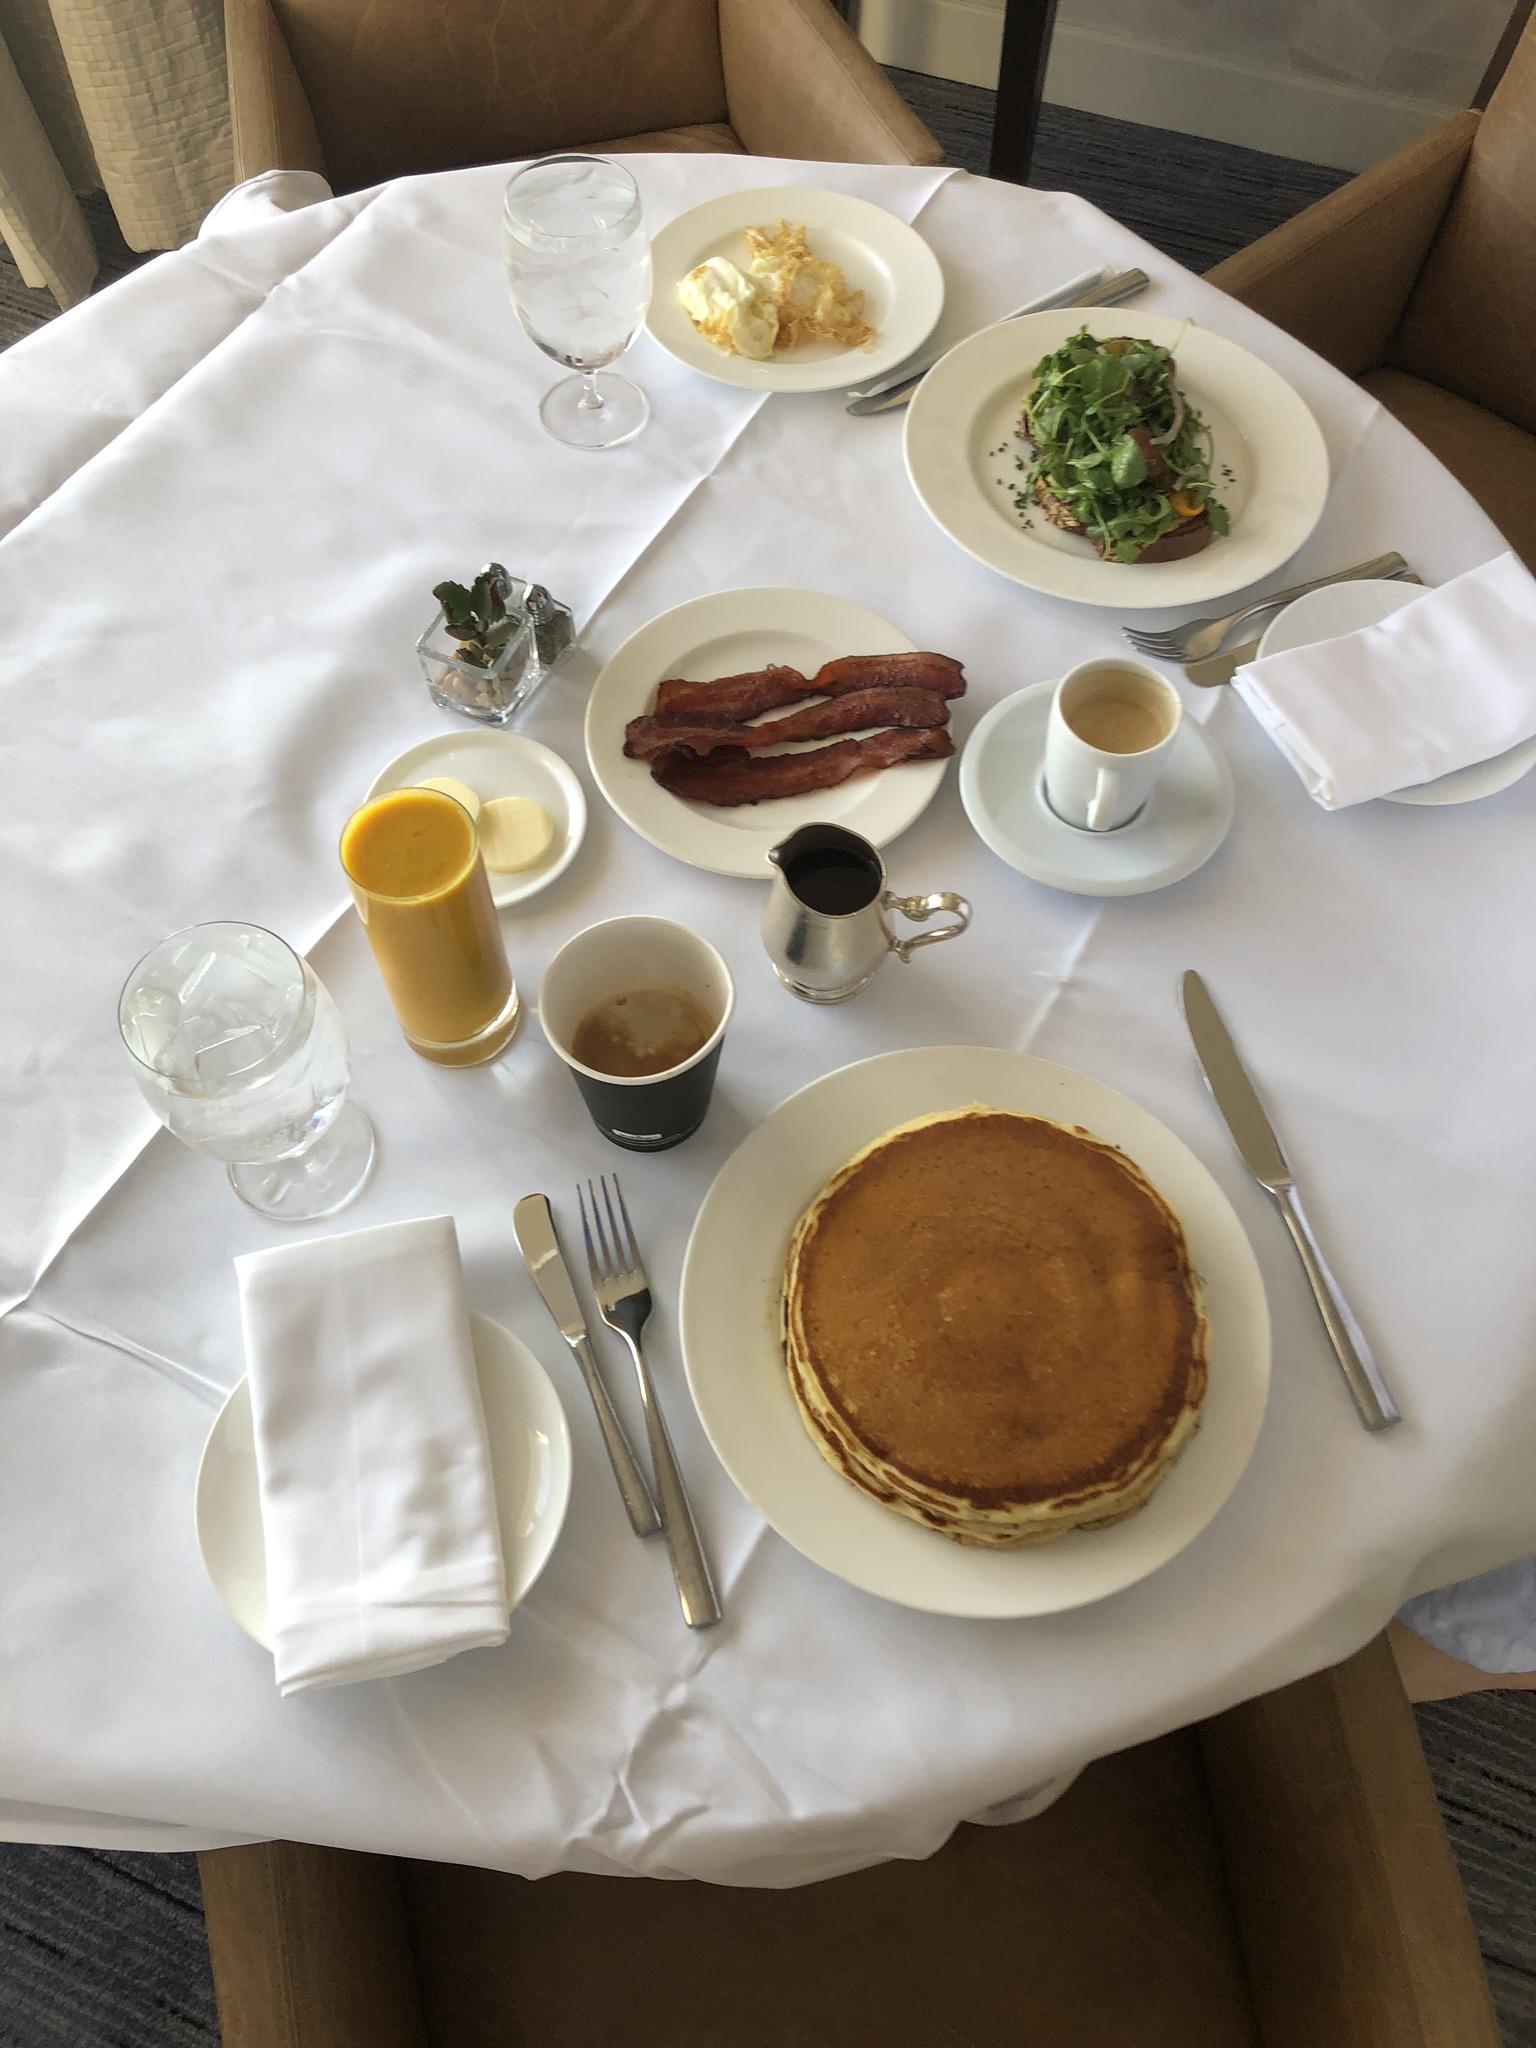 The Ritz Carlton Staycation